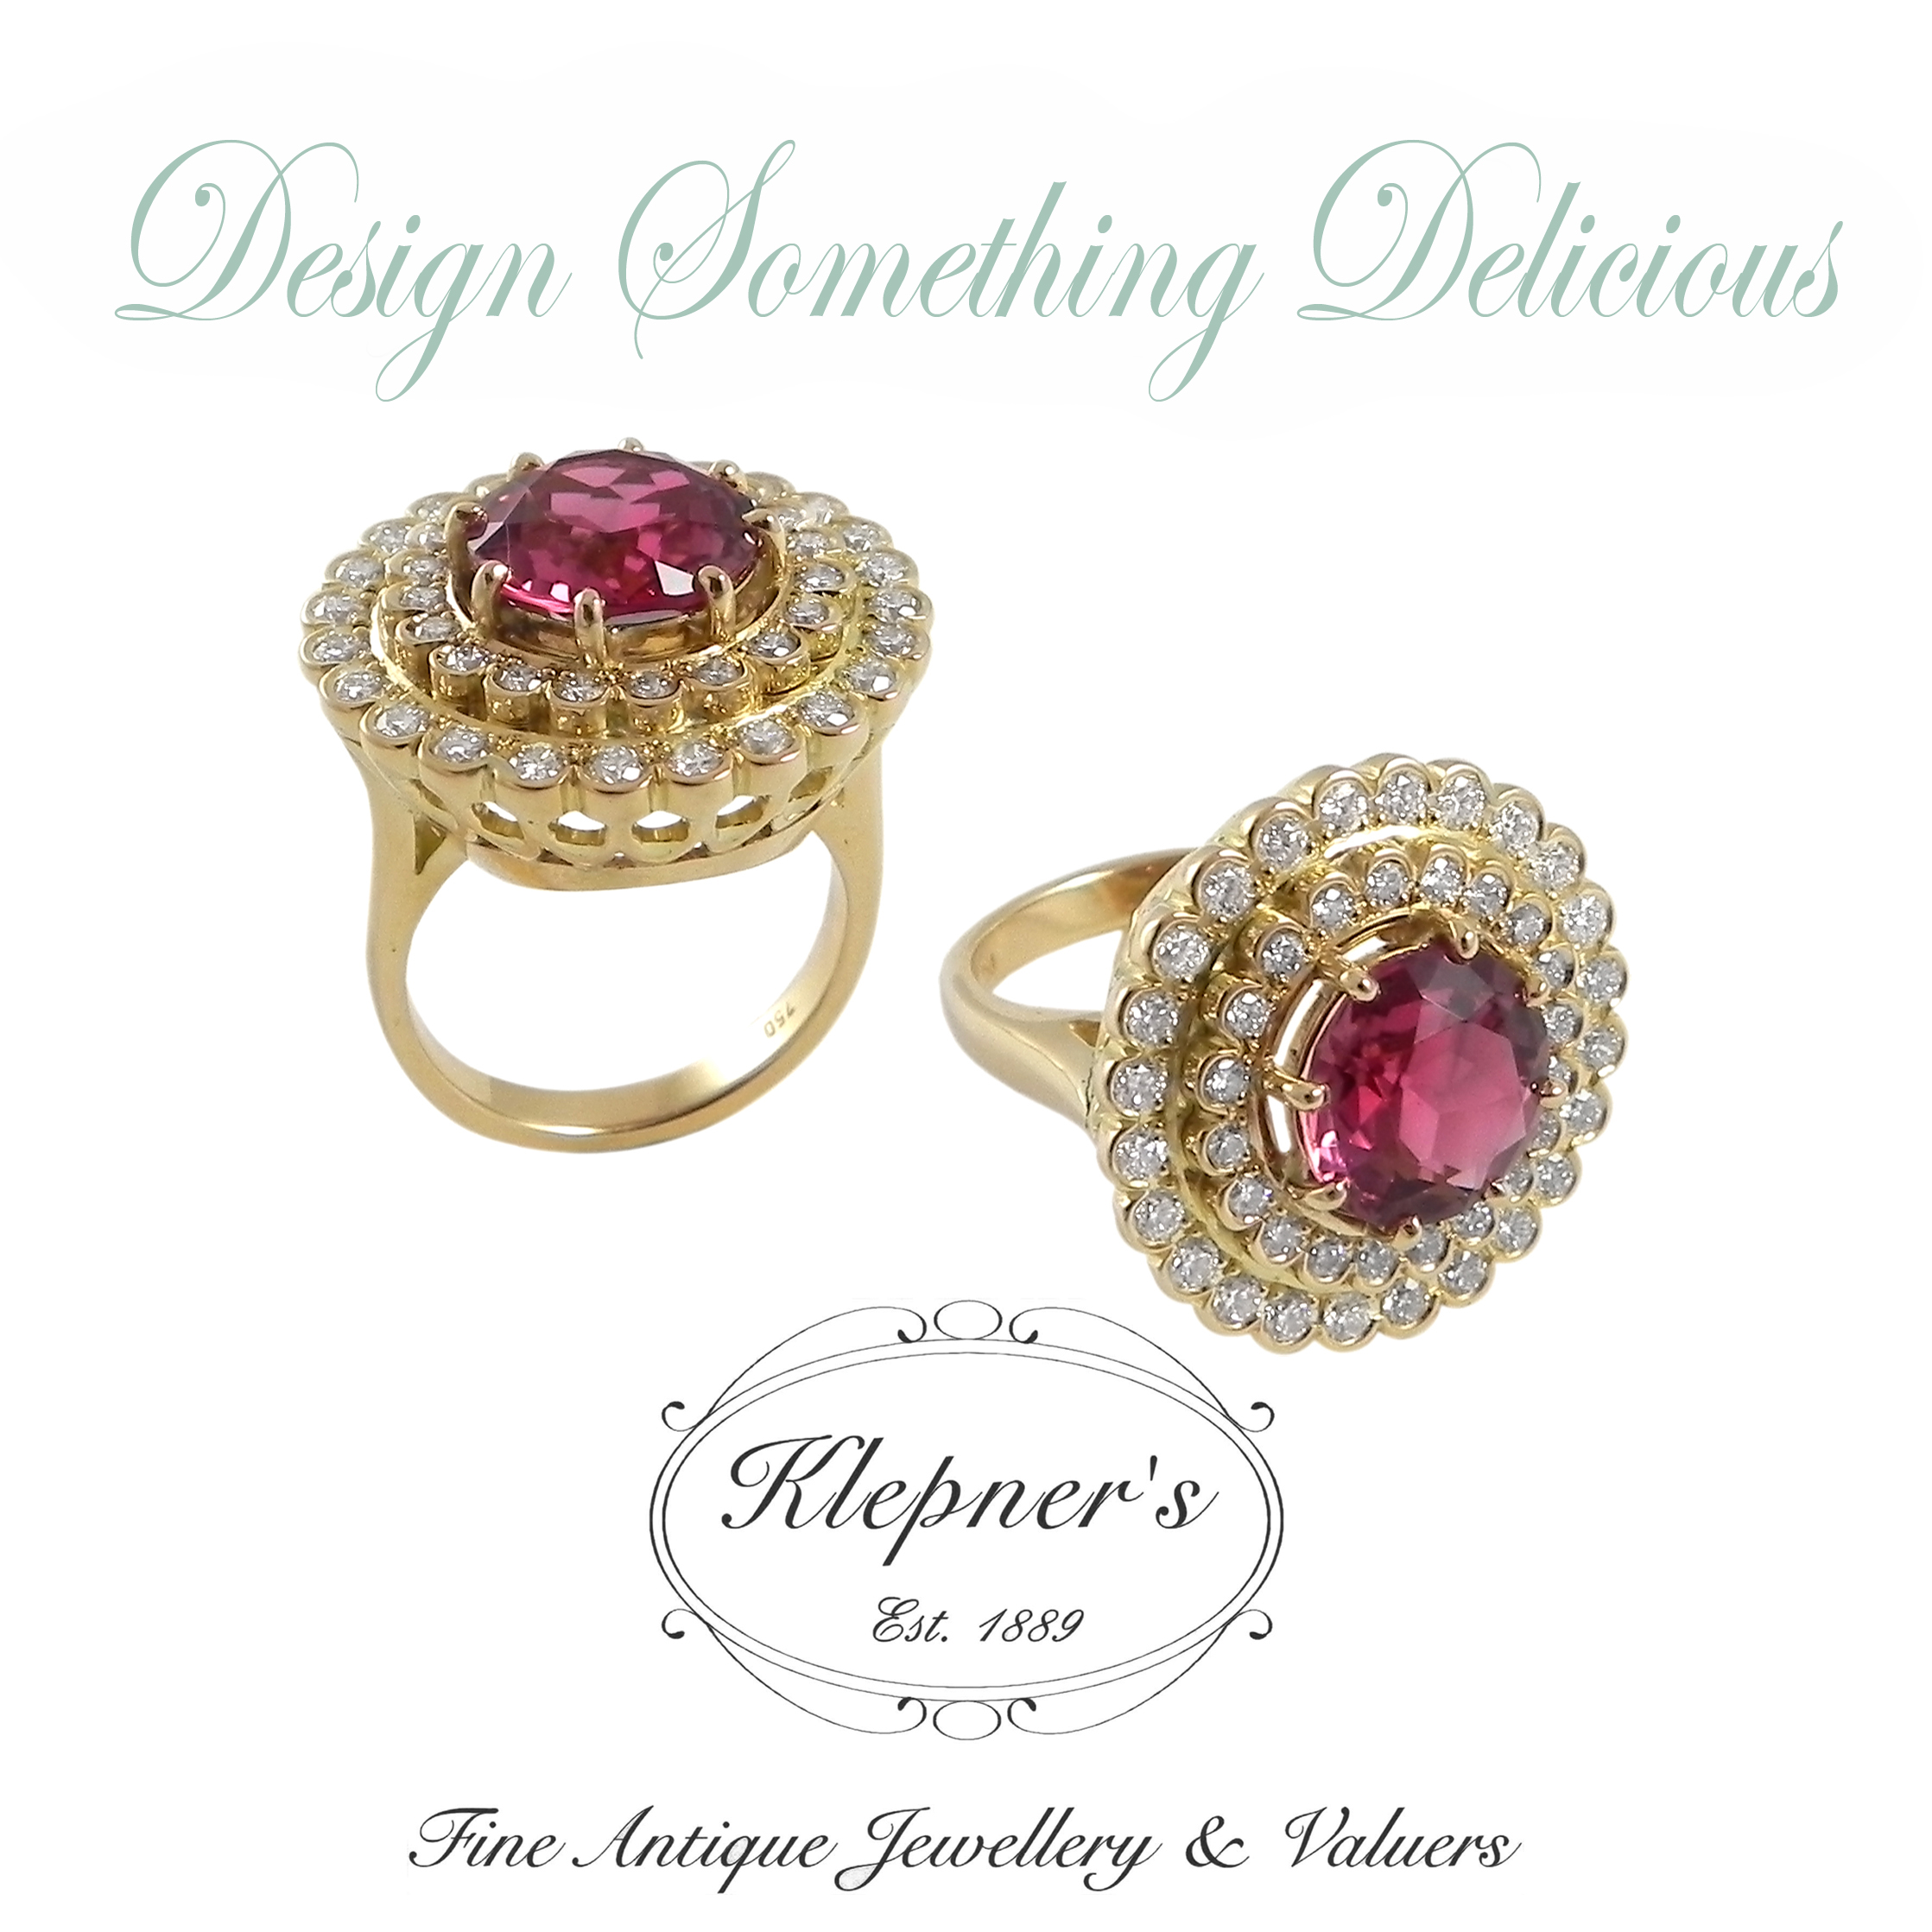 Jewellery Designer Melbourne